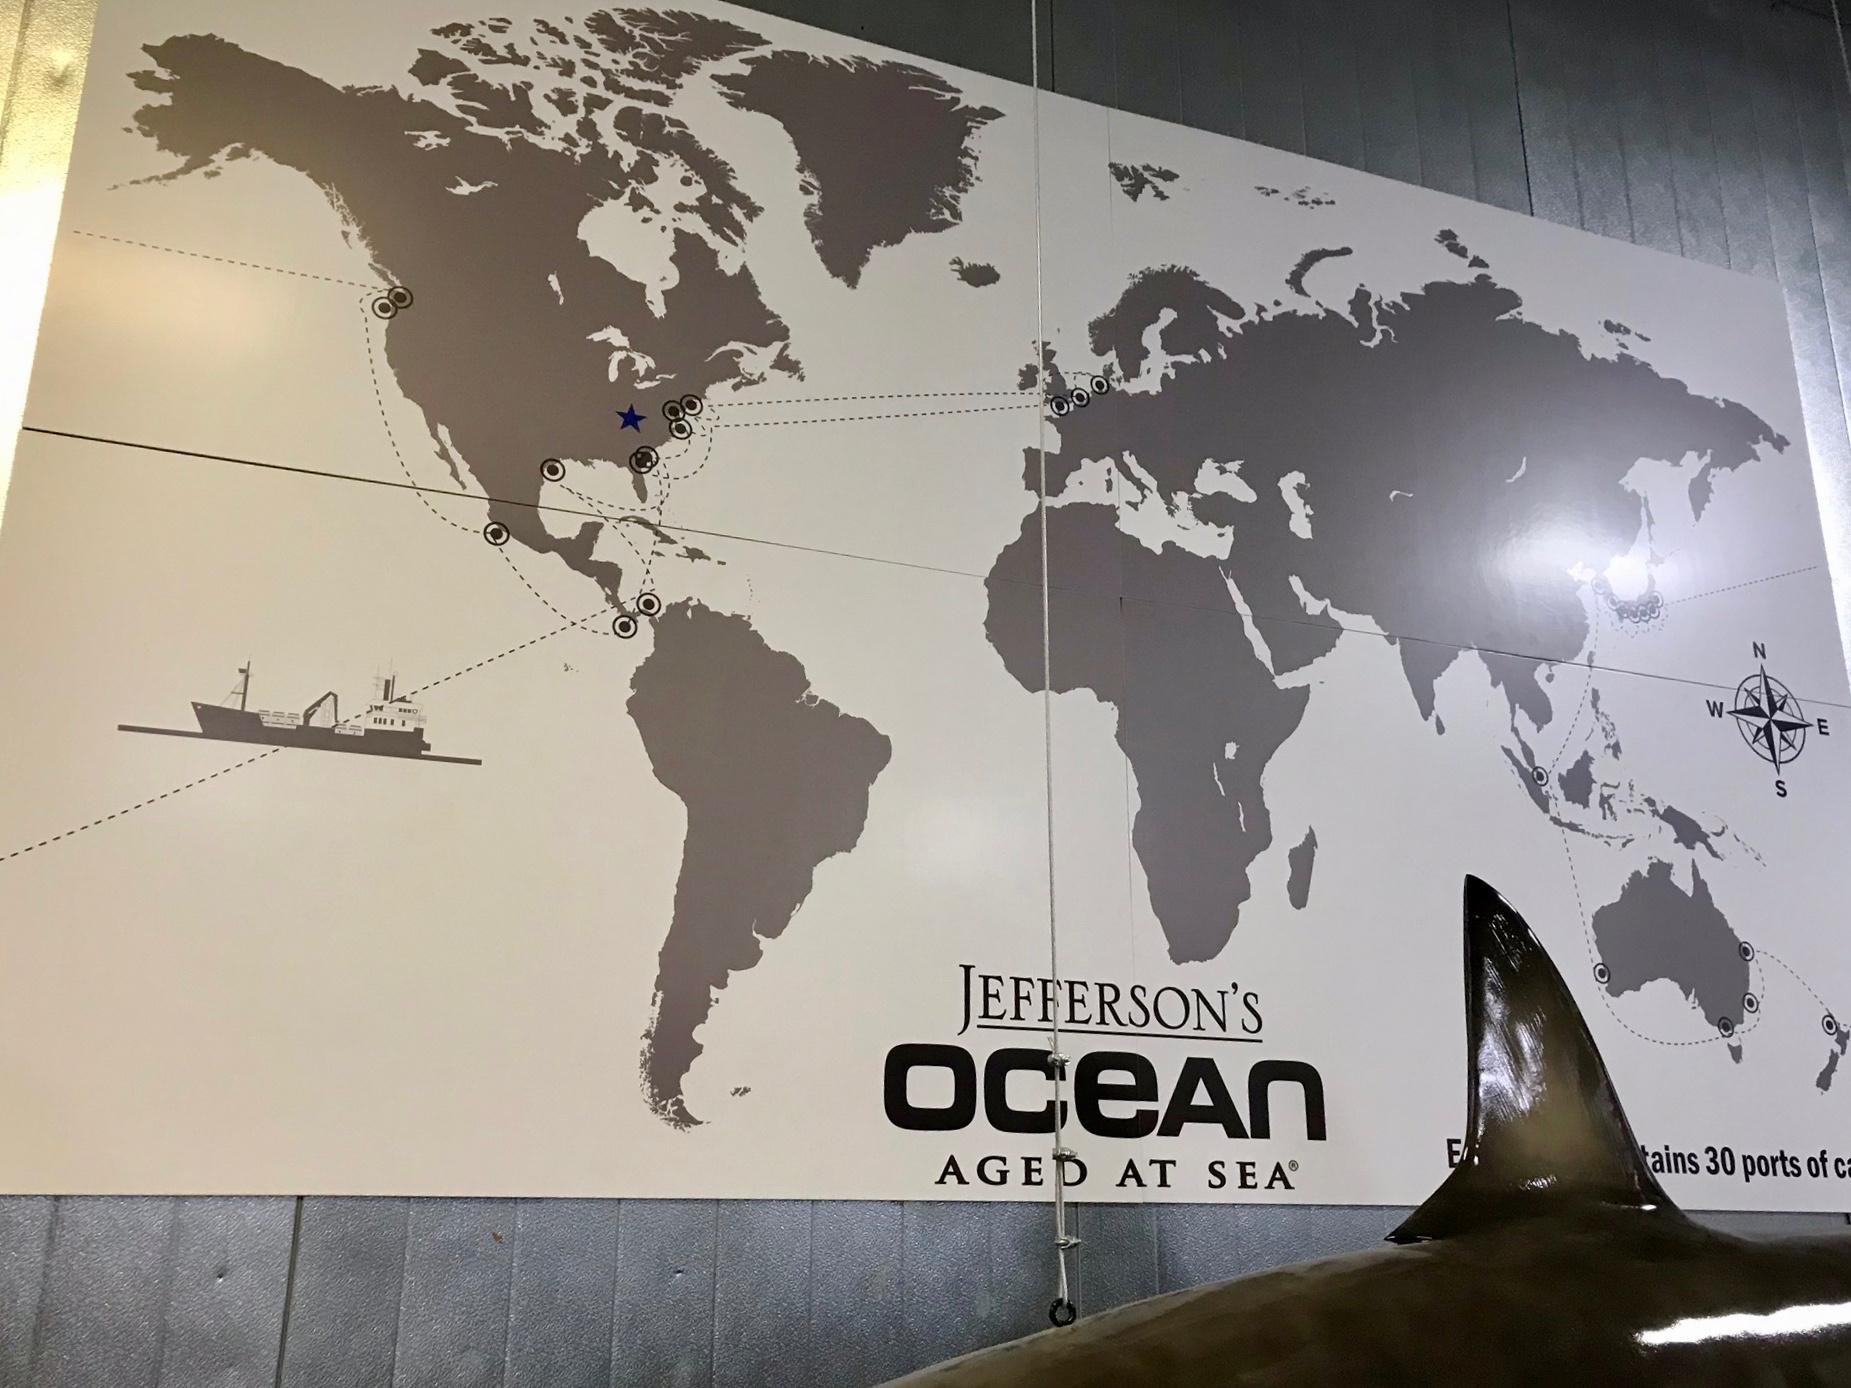 Ports of Call for Jefferson's Ocean - Kentucky Artisan Distillery